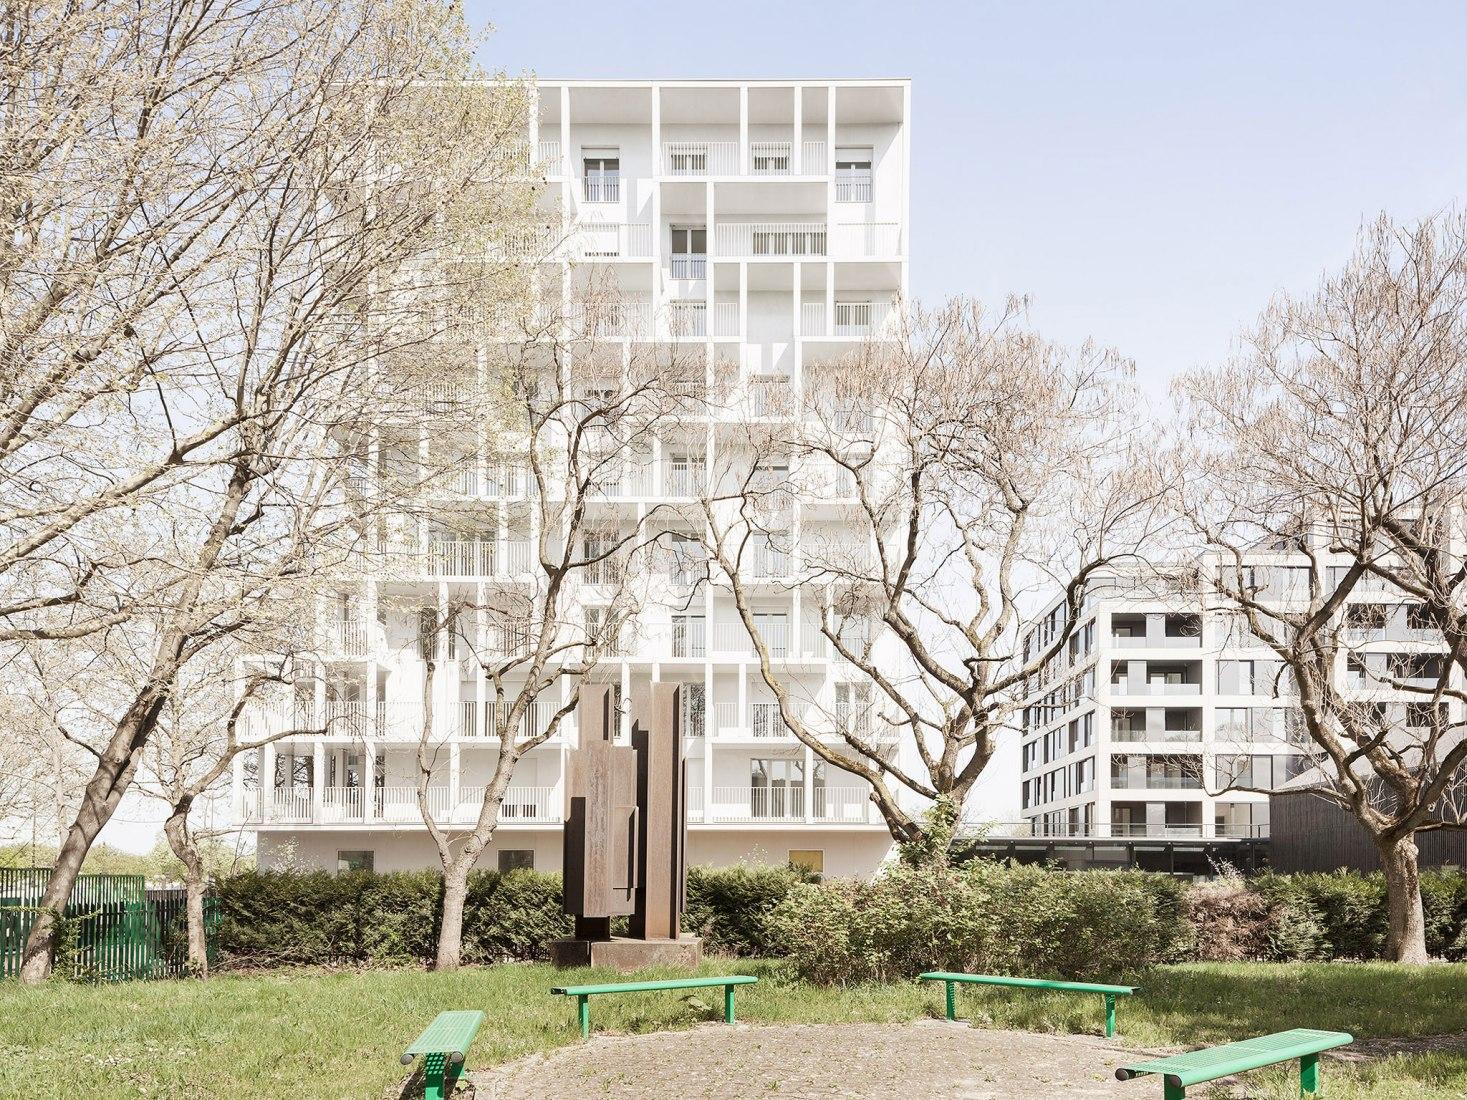 Vista exterior. Croisset Social Housing en París por Hardel Le Bihan Architects. Fotografía por ©Schnepp Renou